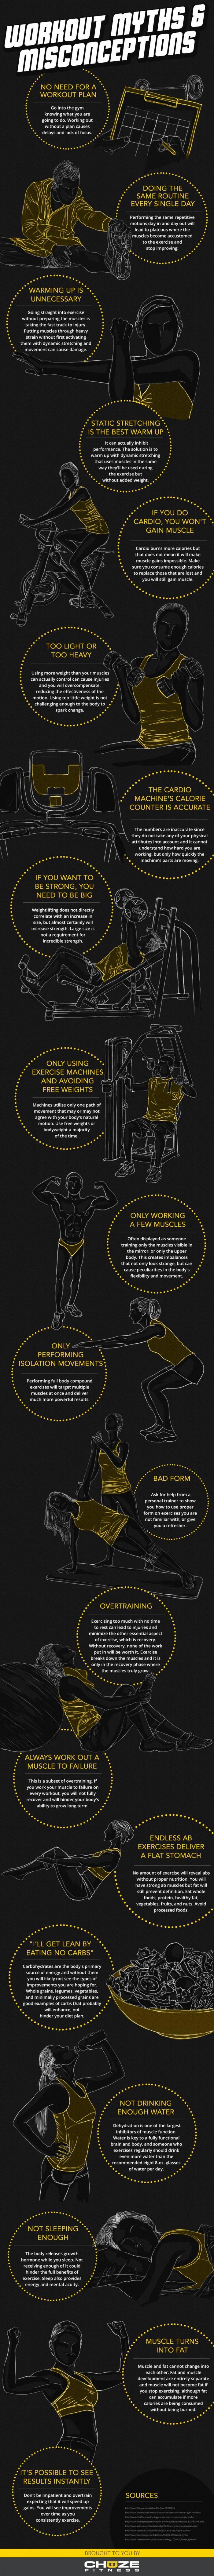 WorkoutMythsandMisconceptions